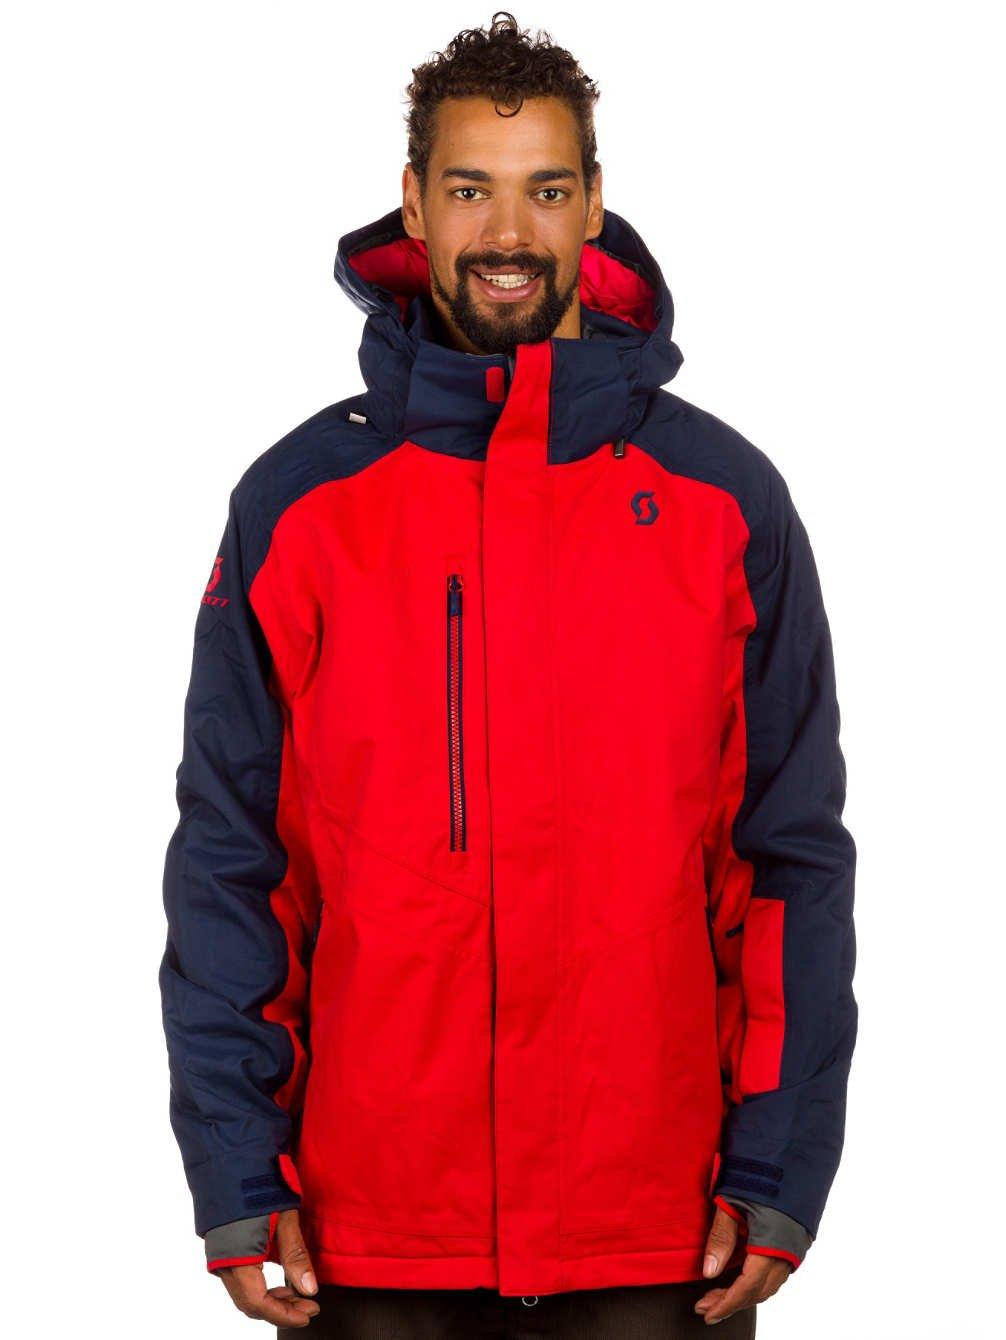 Herren Snowboard Jacke Scott Mumford Jacket bestellen